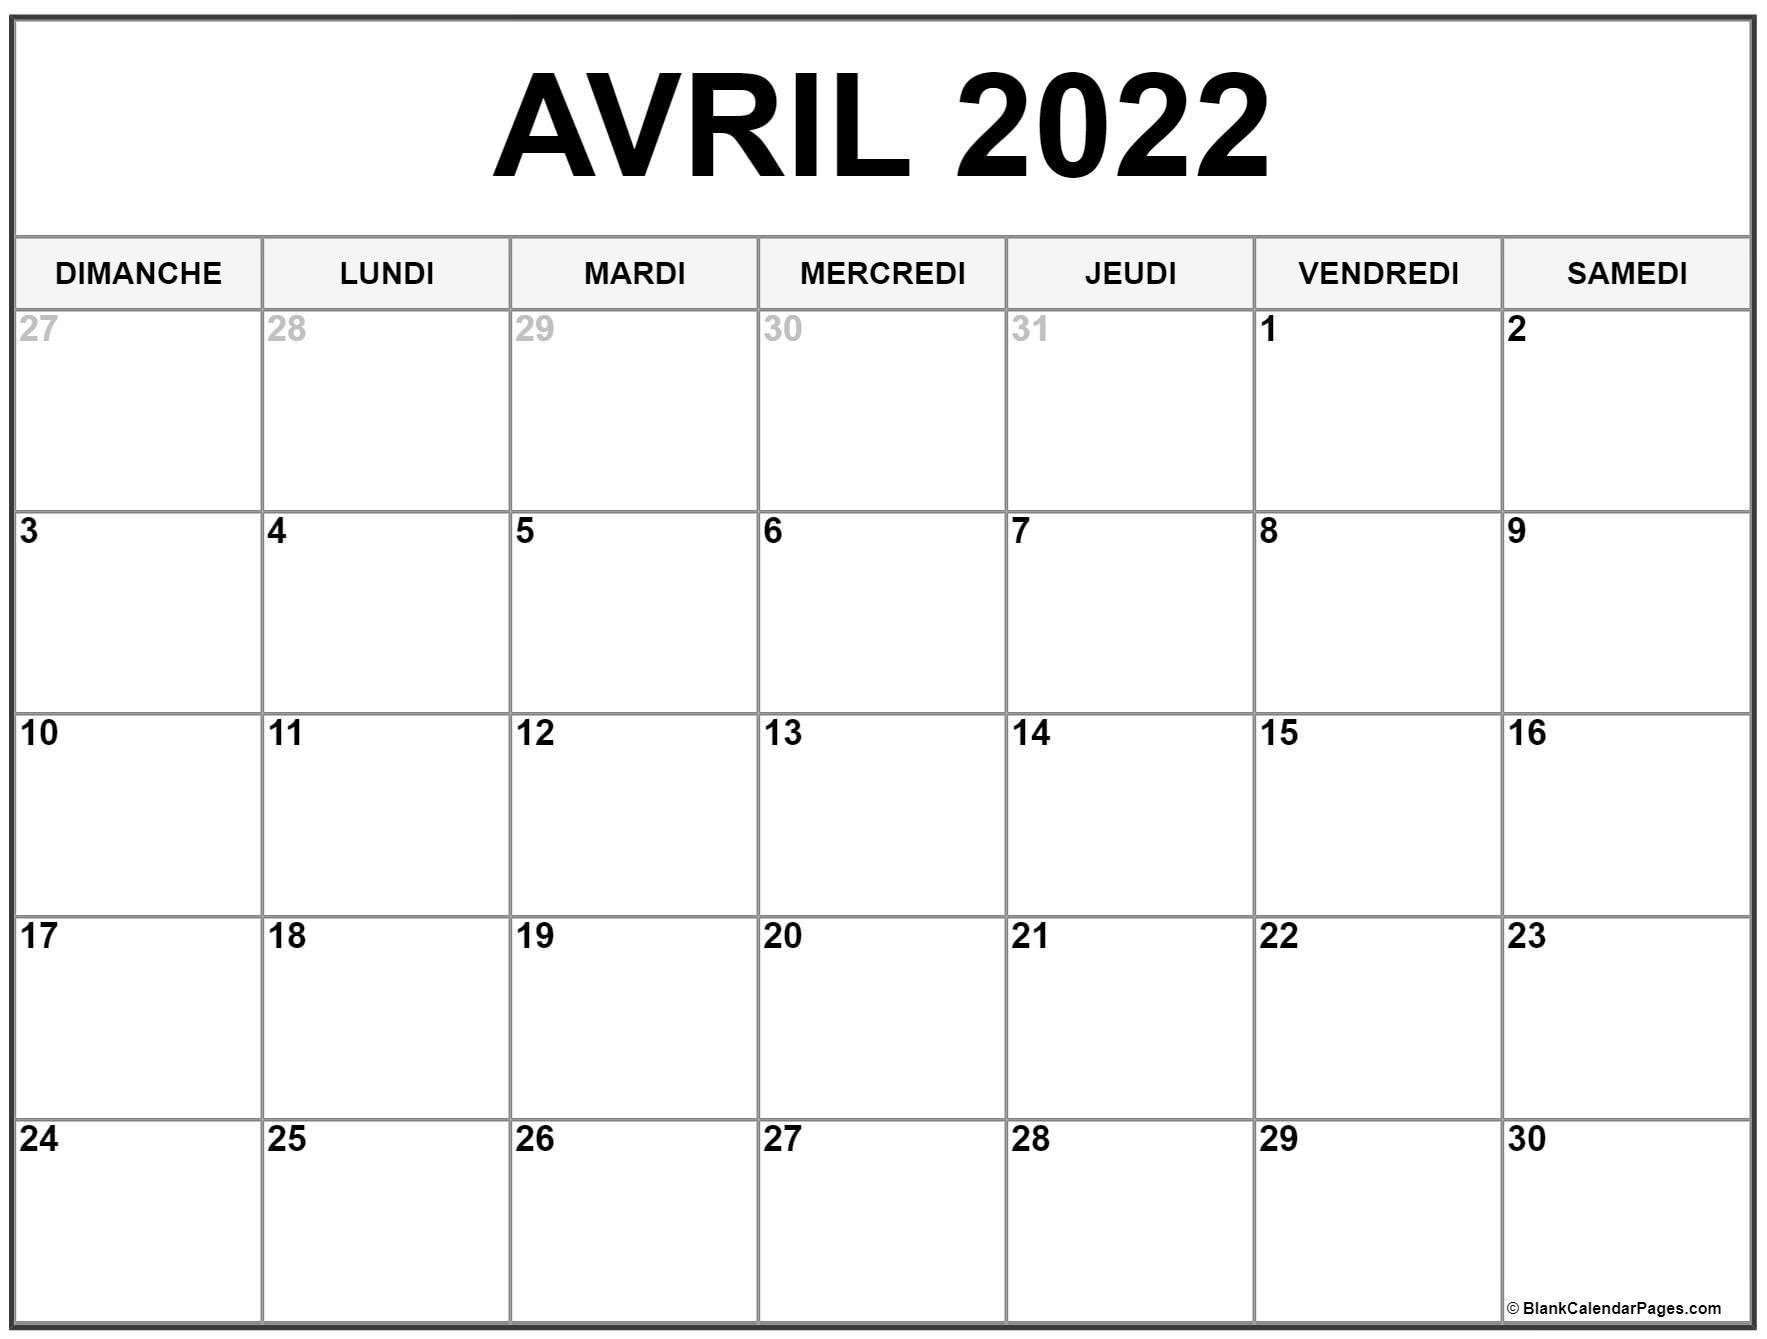 Calendrier Avril 2022 à Imprimer